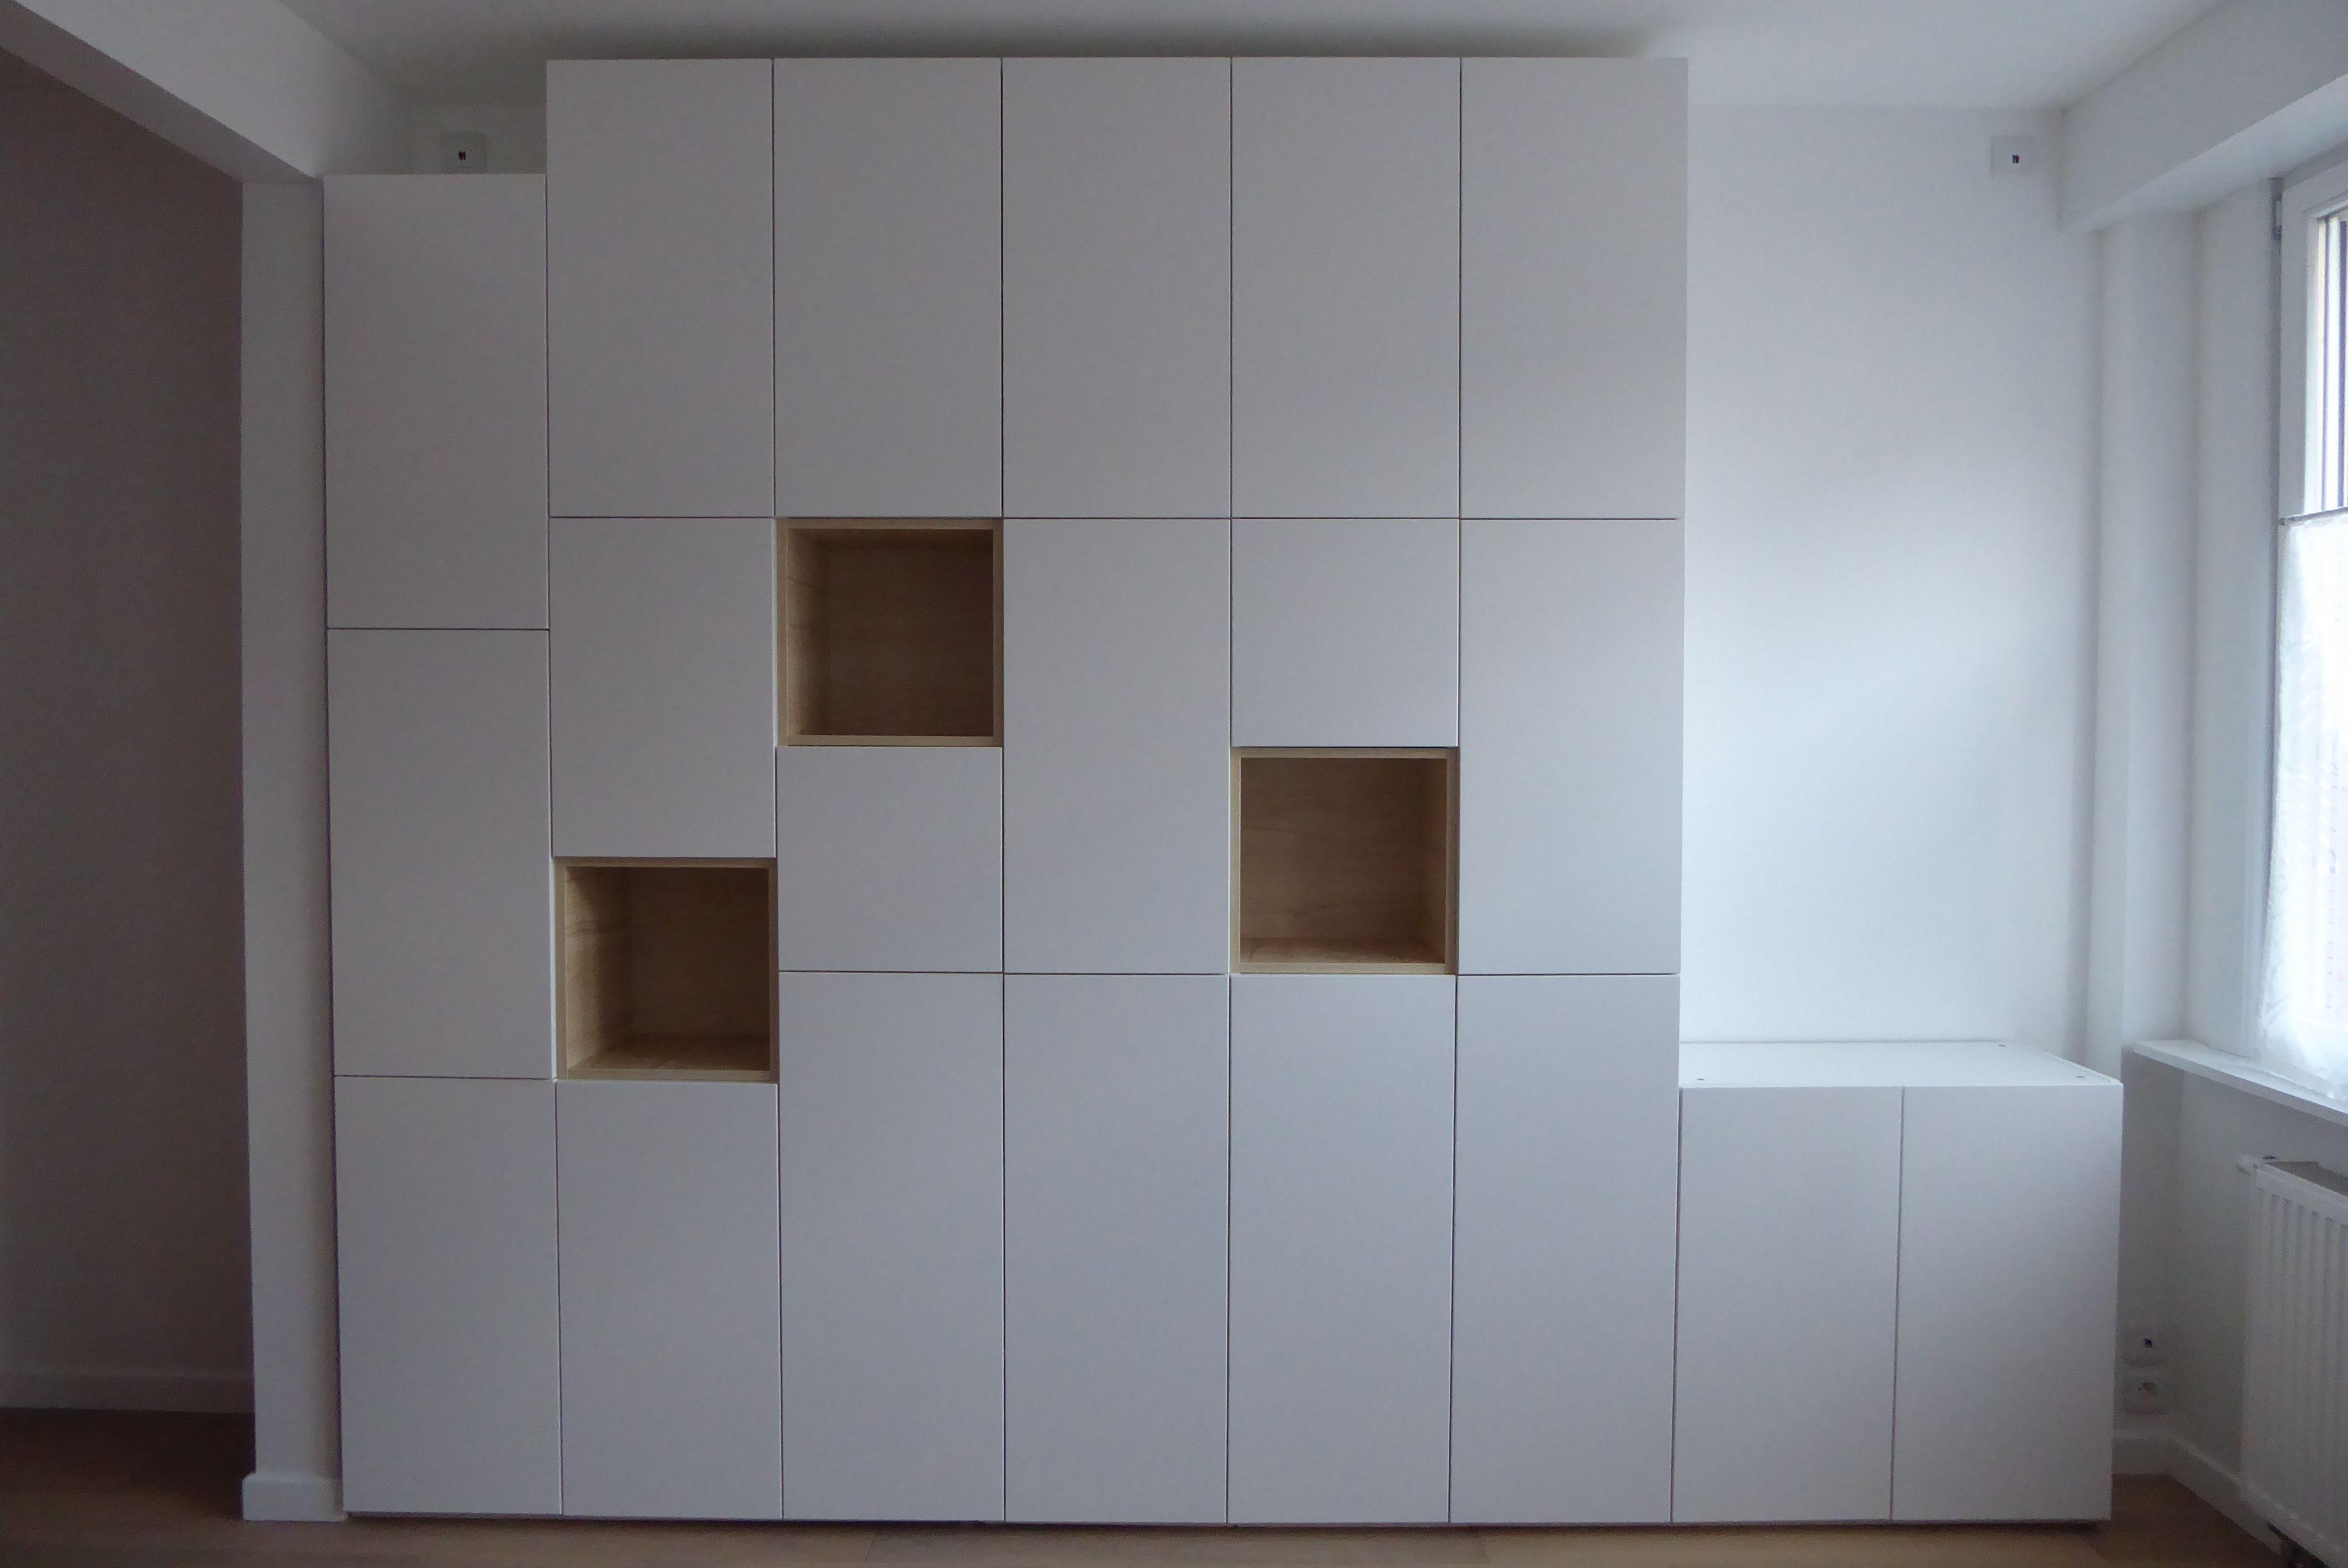 bibliotheque faite à partir de metod (ikea) | mur placard salon en